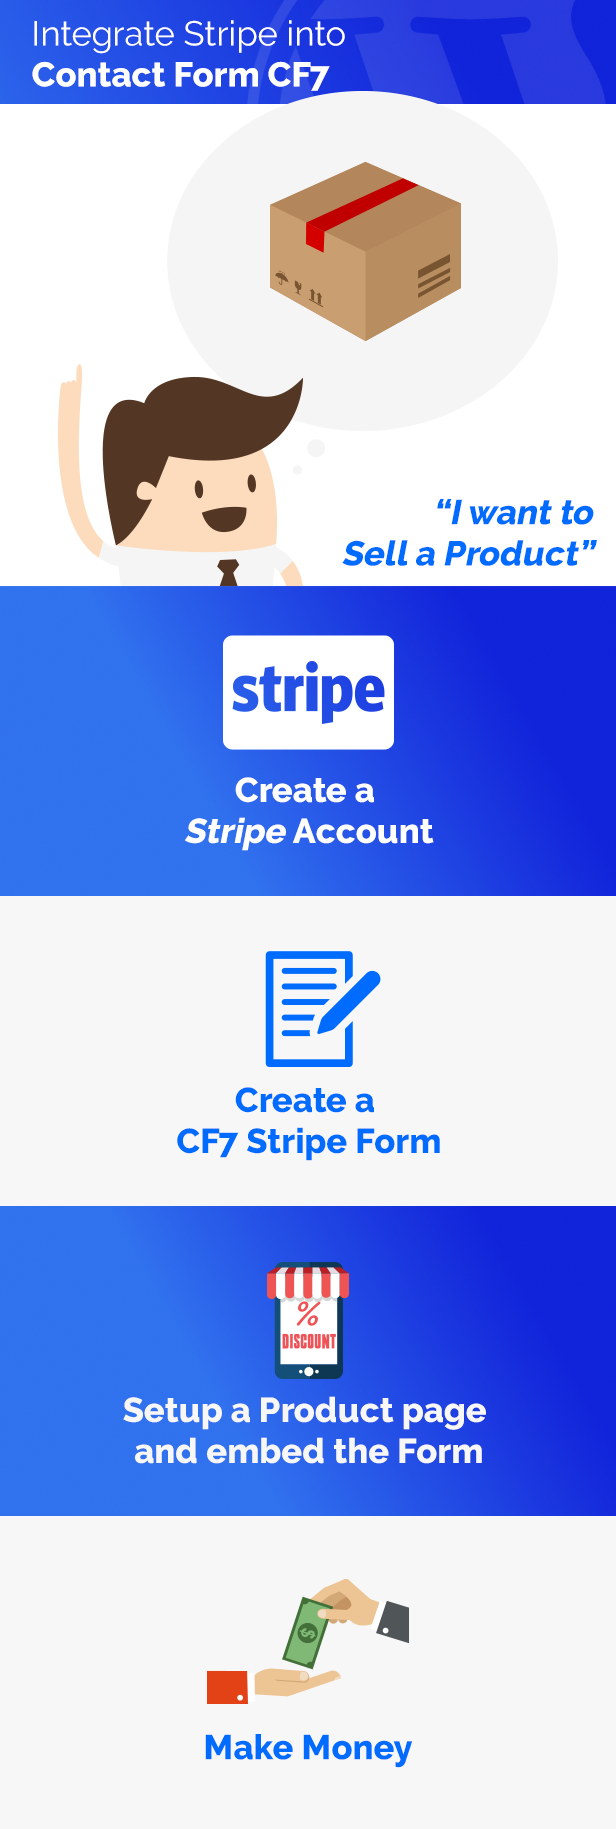 Create a Stripe Account, Setup a form, embed it on a page and make money.